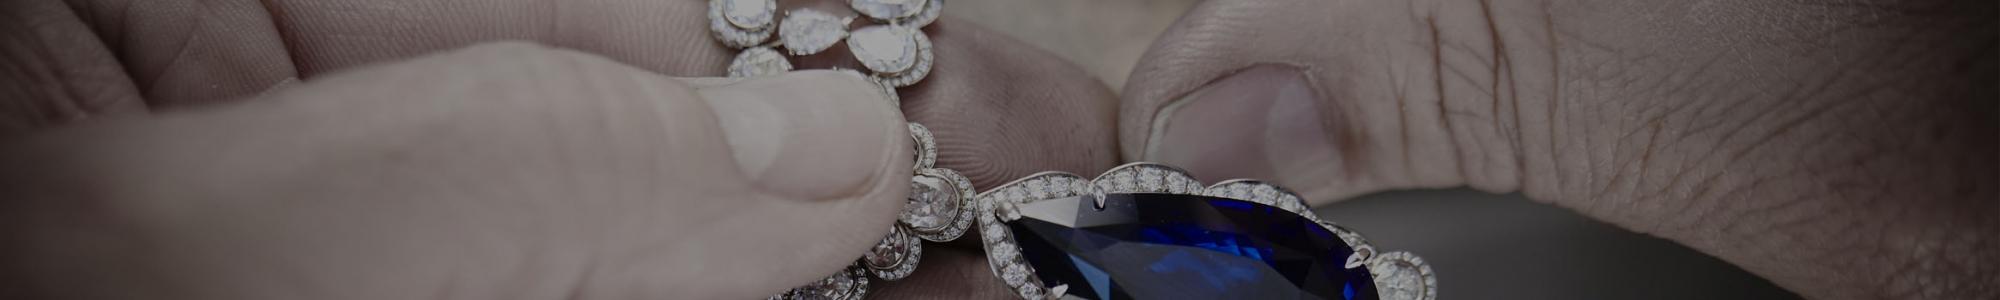 Chopard-High-Jewellery-Header